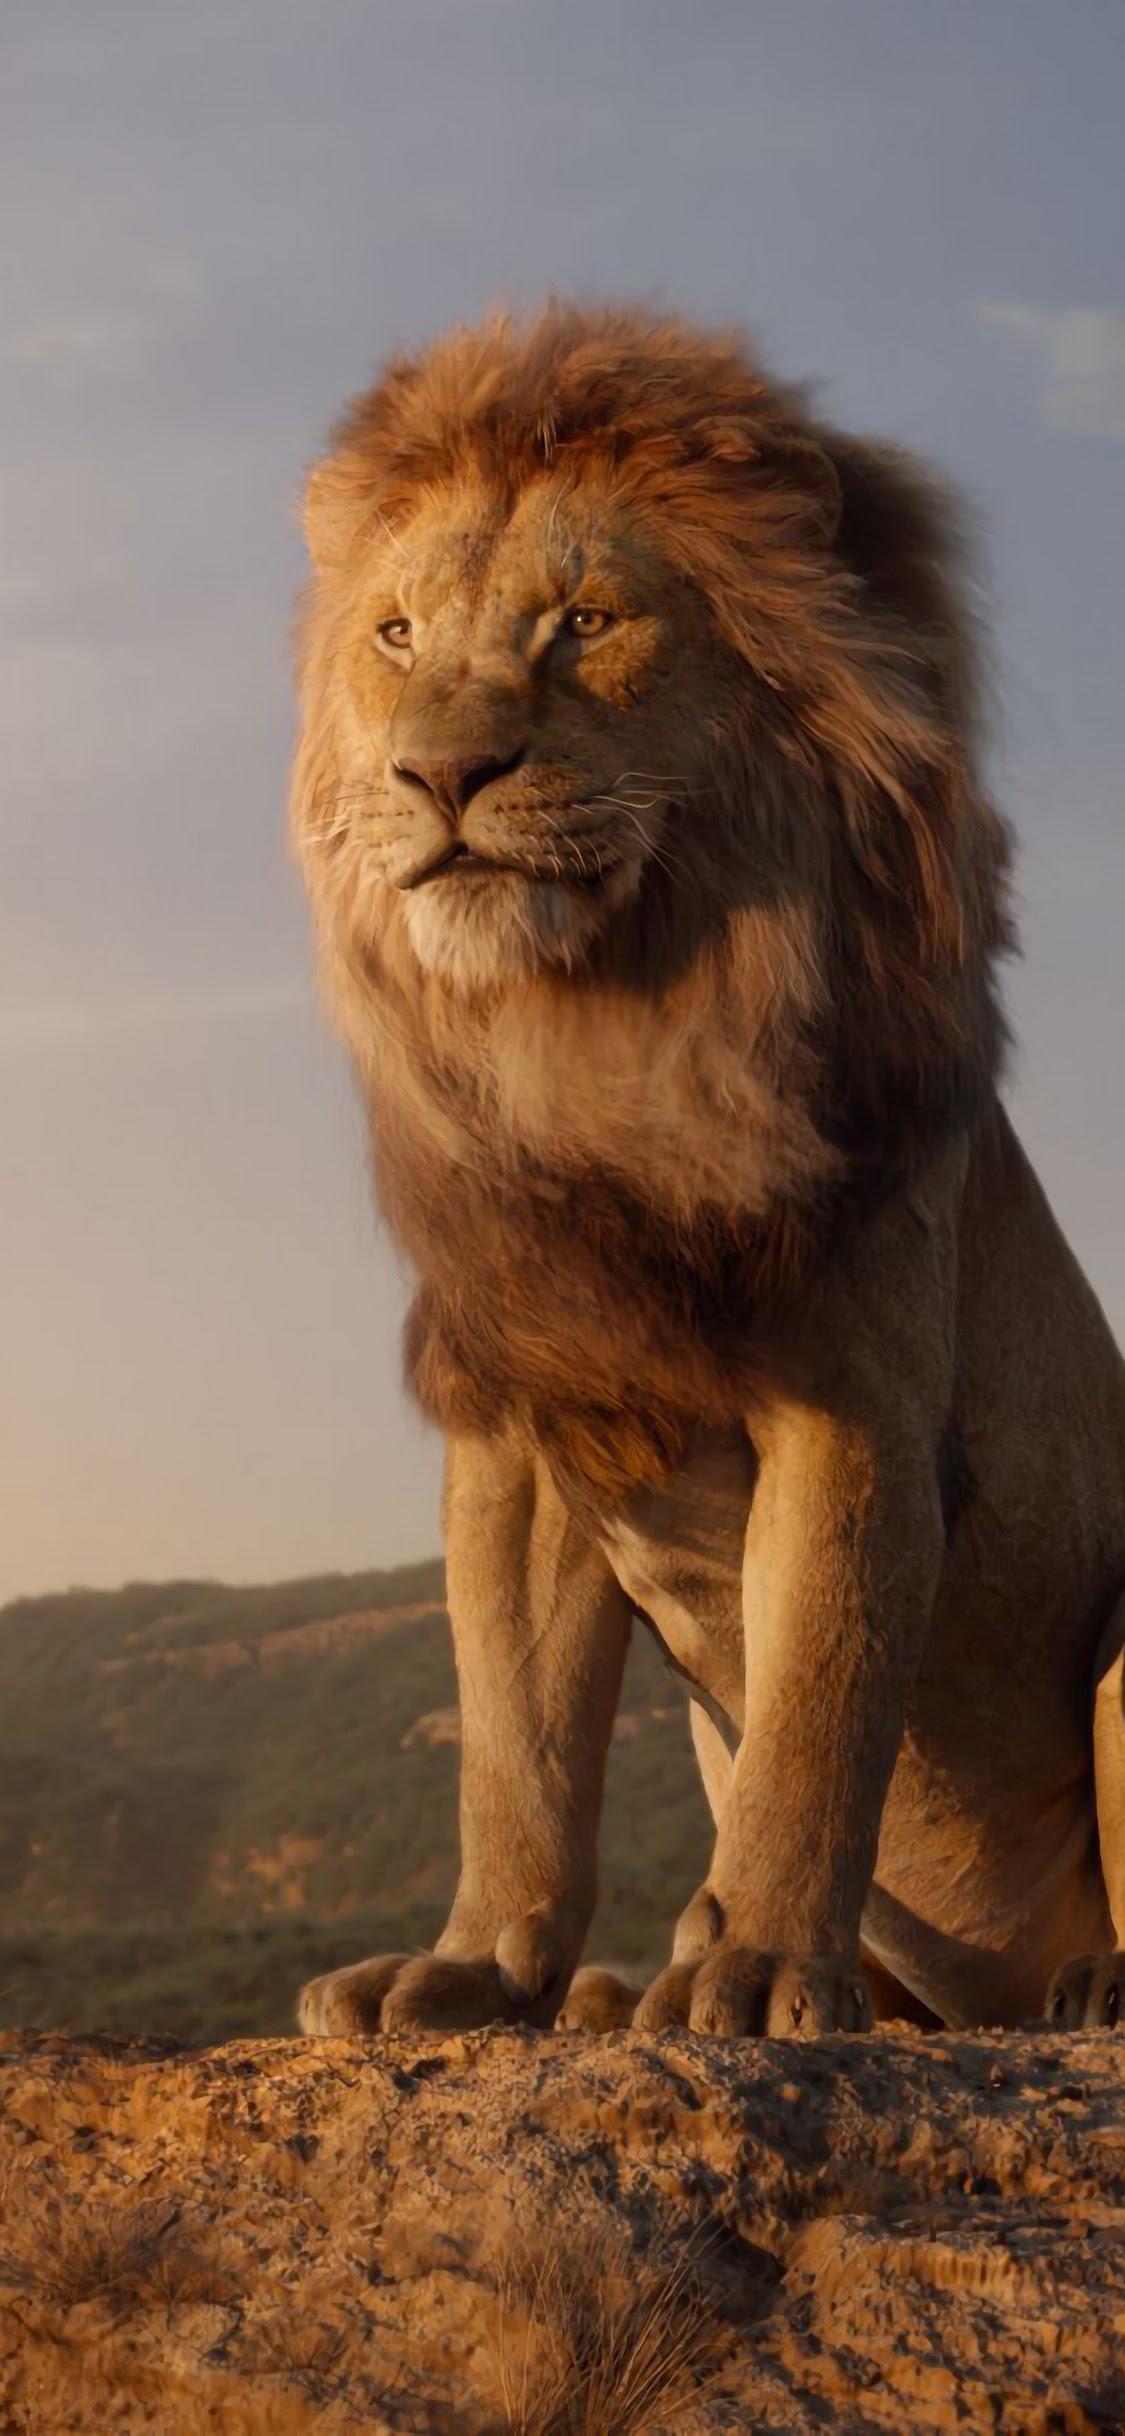 The Lion King 2019 Mufasa Simba 4k Wallpaper 18